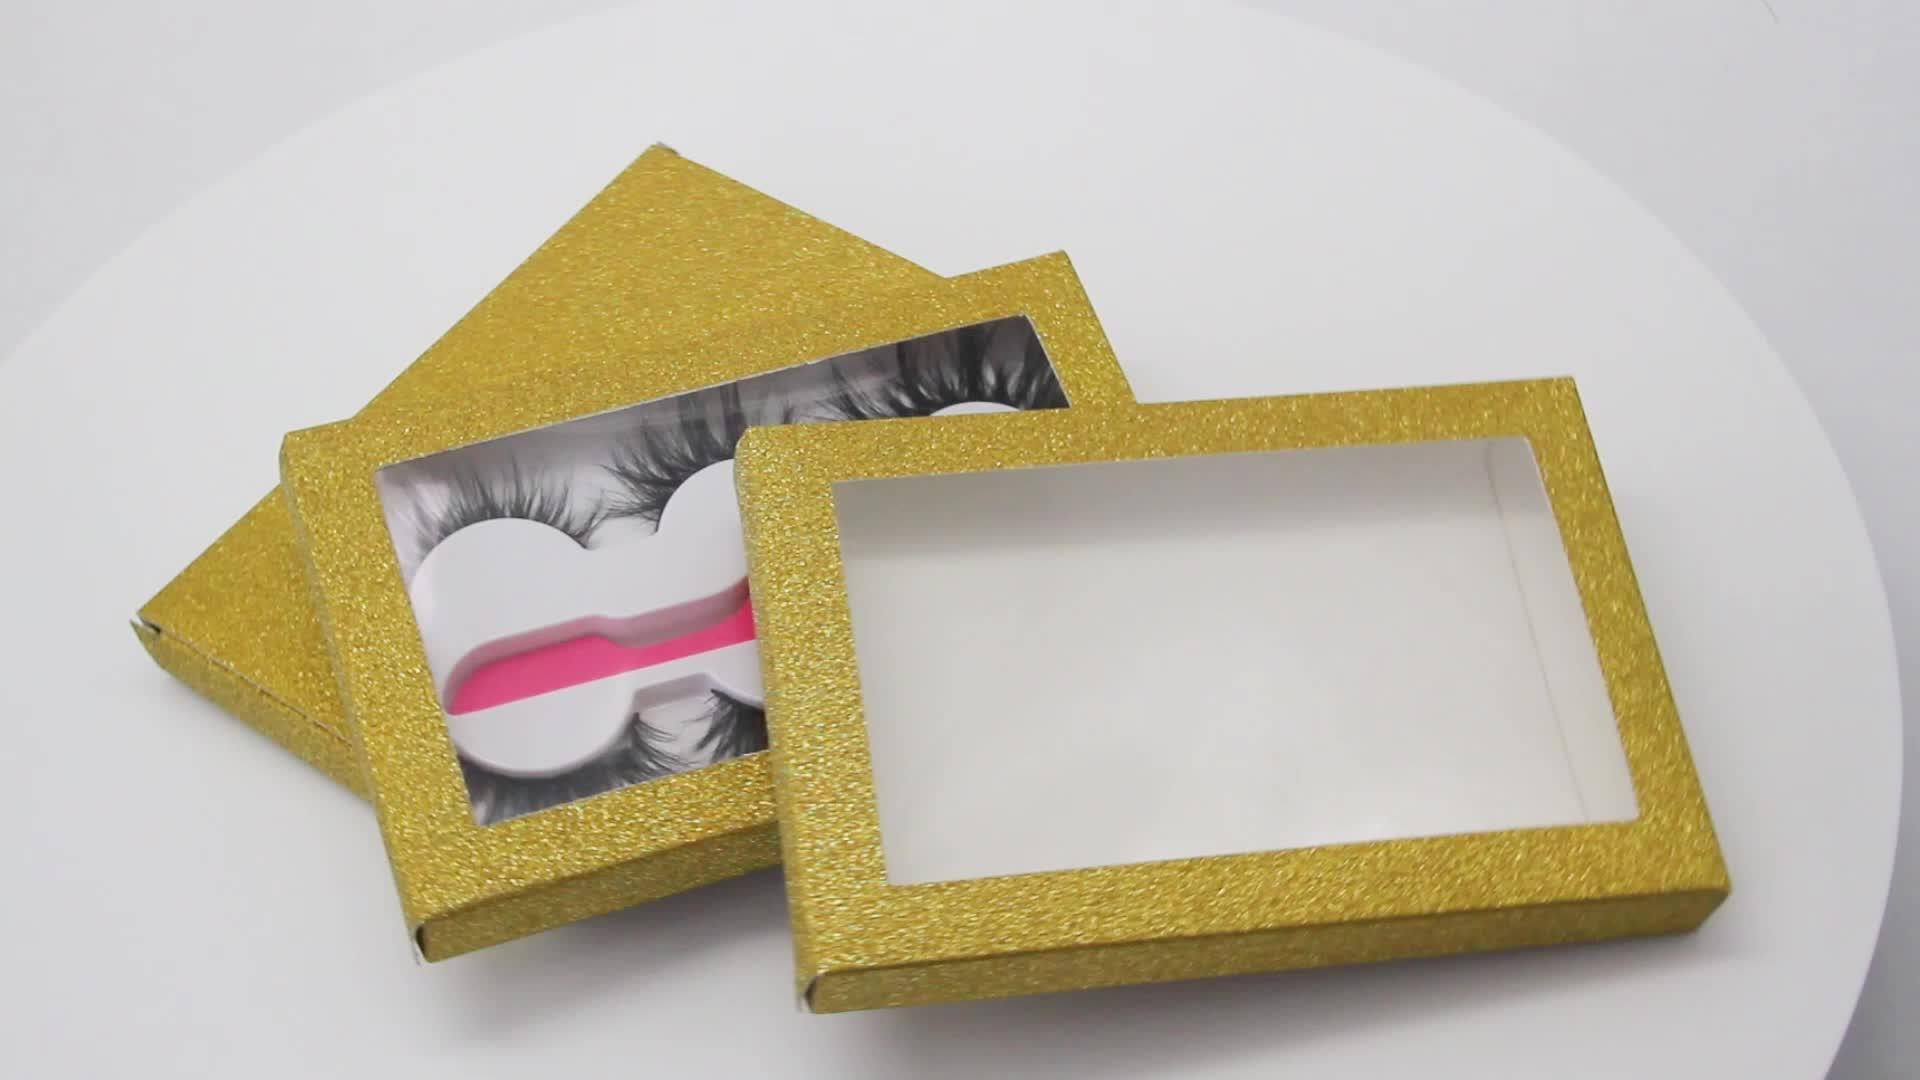 Wimpers Custom Verpakking 3 Pairs Lash Boek Met Pincet Goud Glitter wimpers pakket box